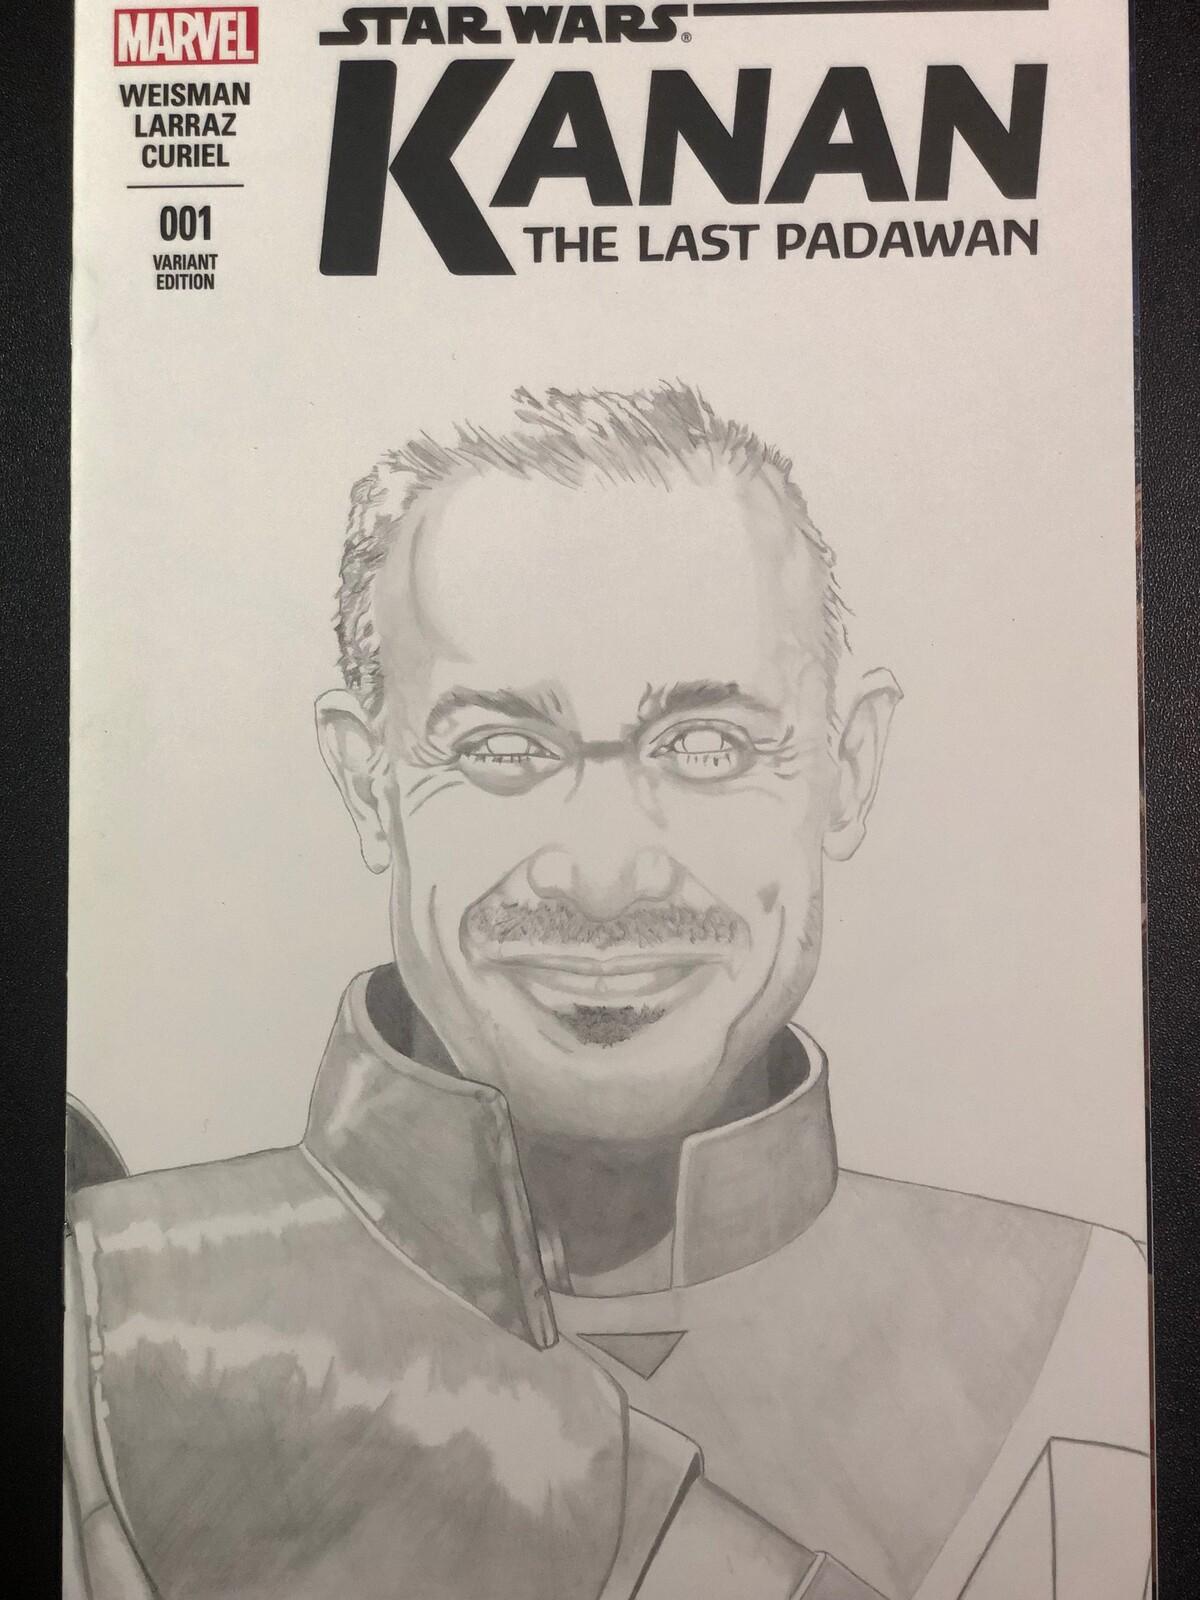 Comic cover art Freddie Prince Jr as Kanan